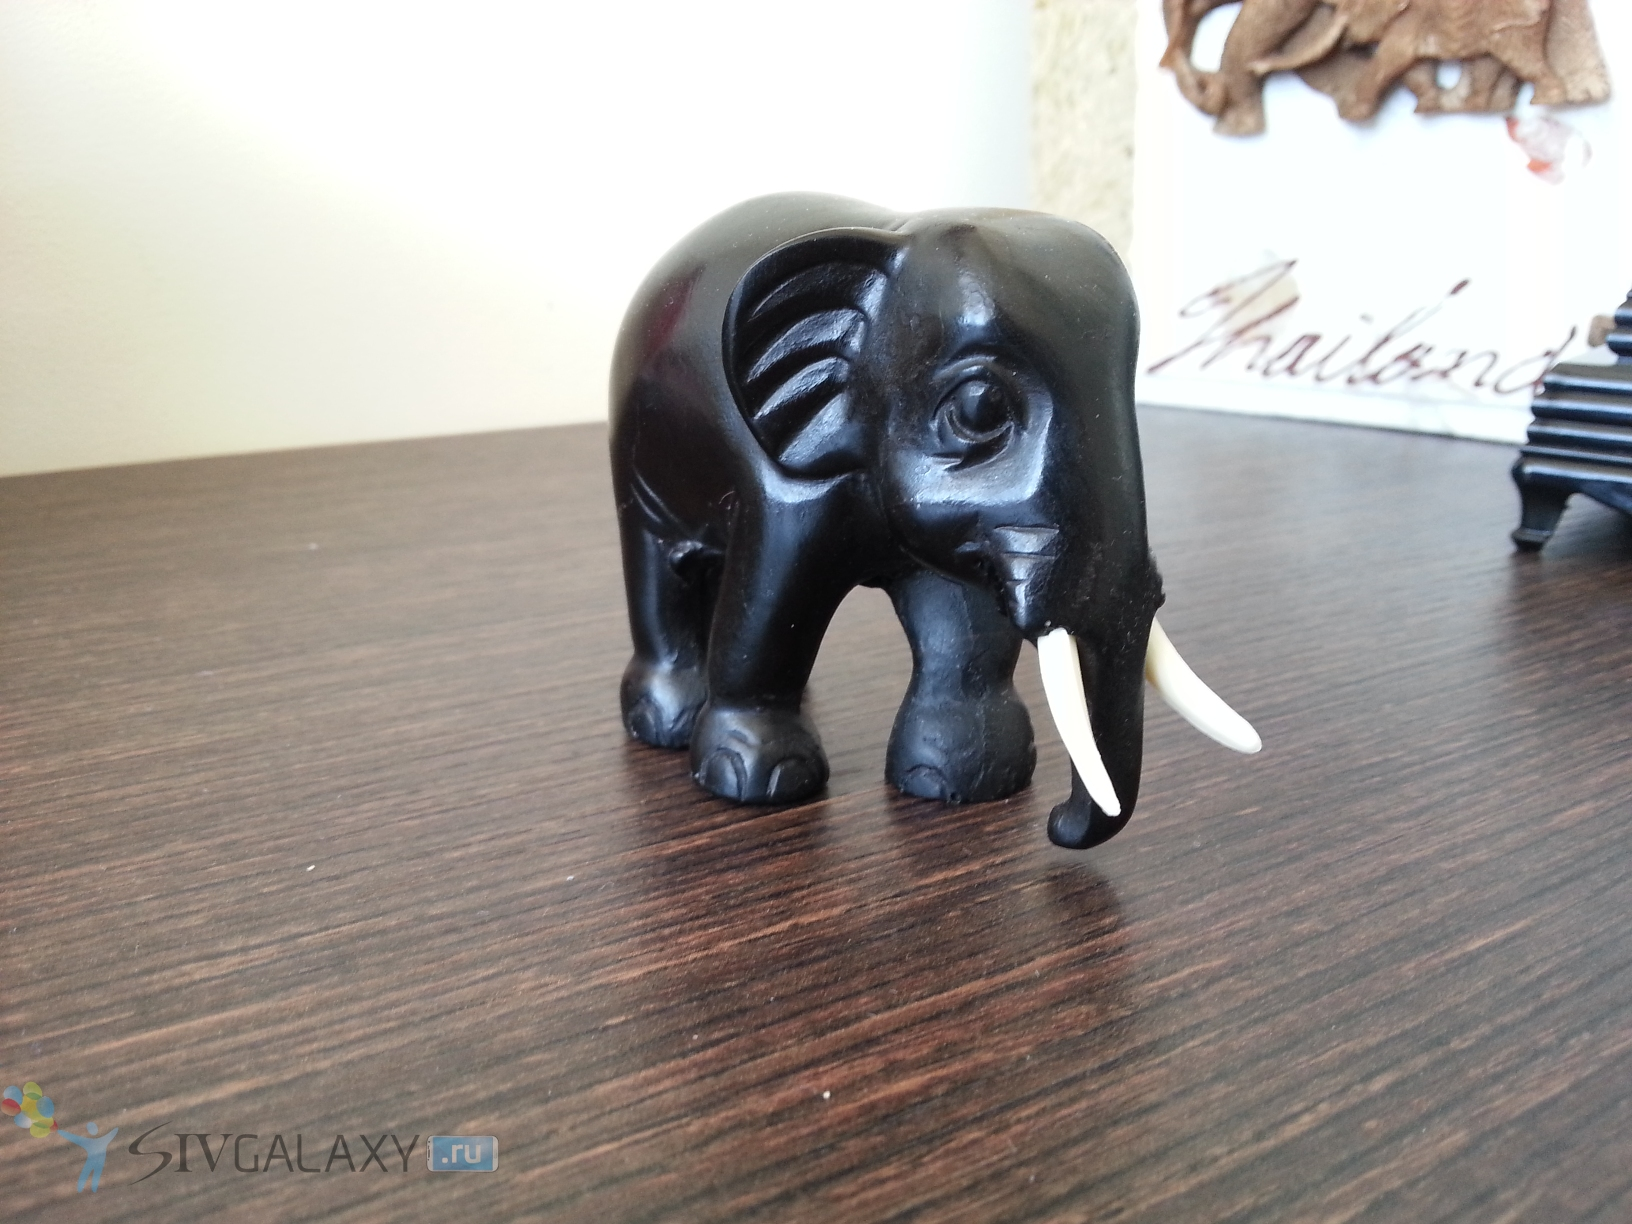 Фото с камеры Samsung Galaxy S3 - слон-сувенир